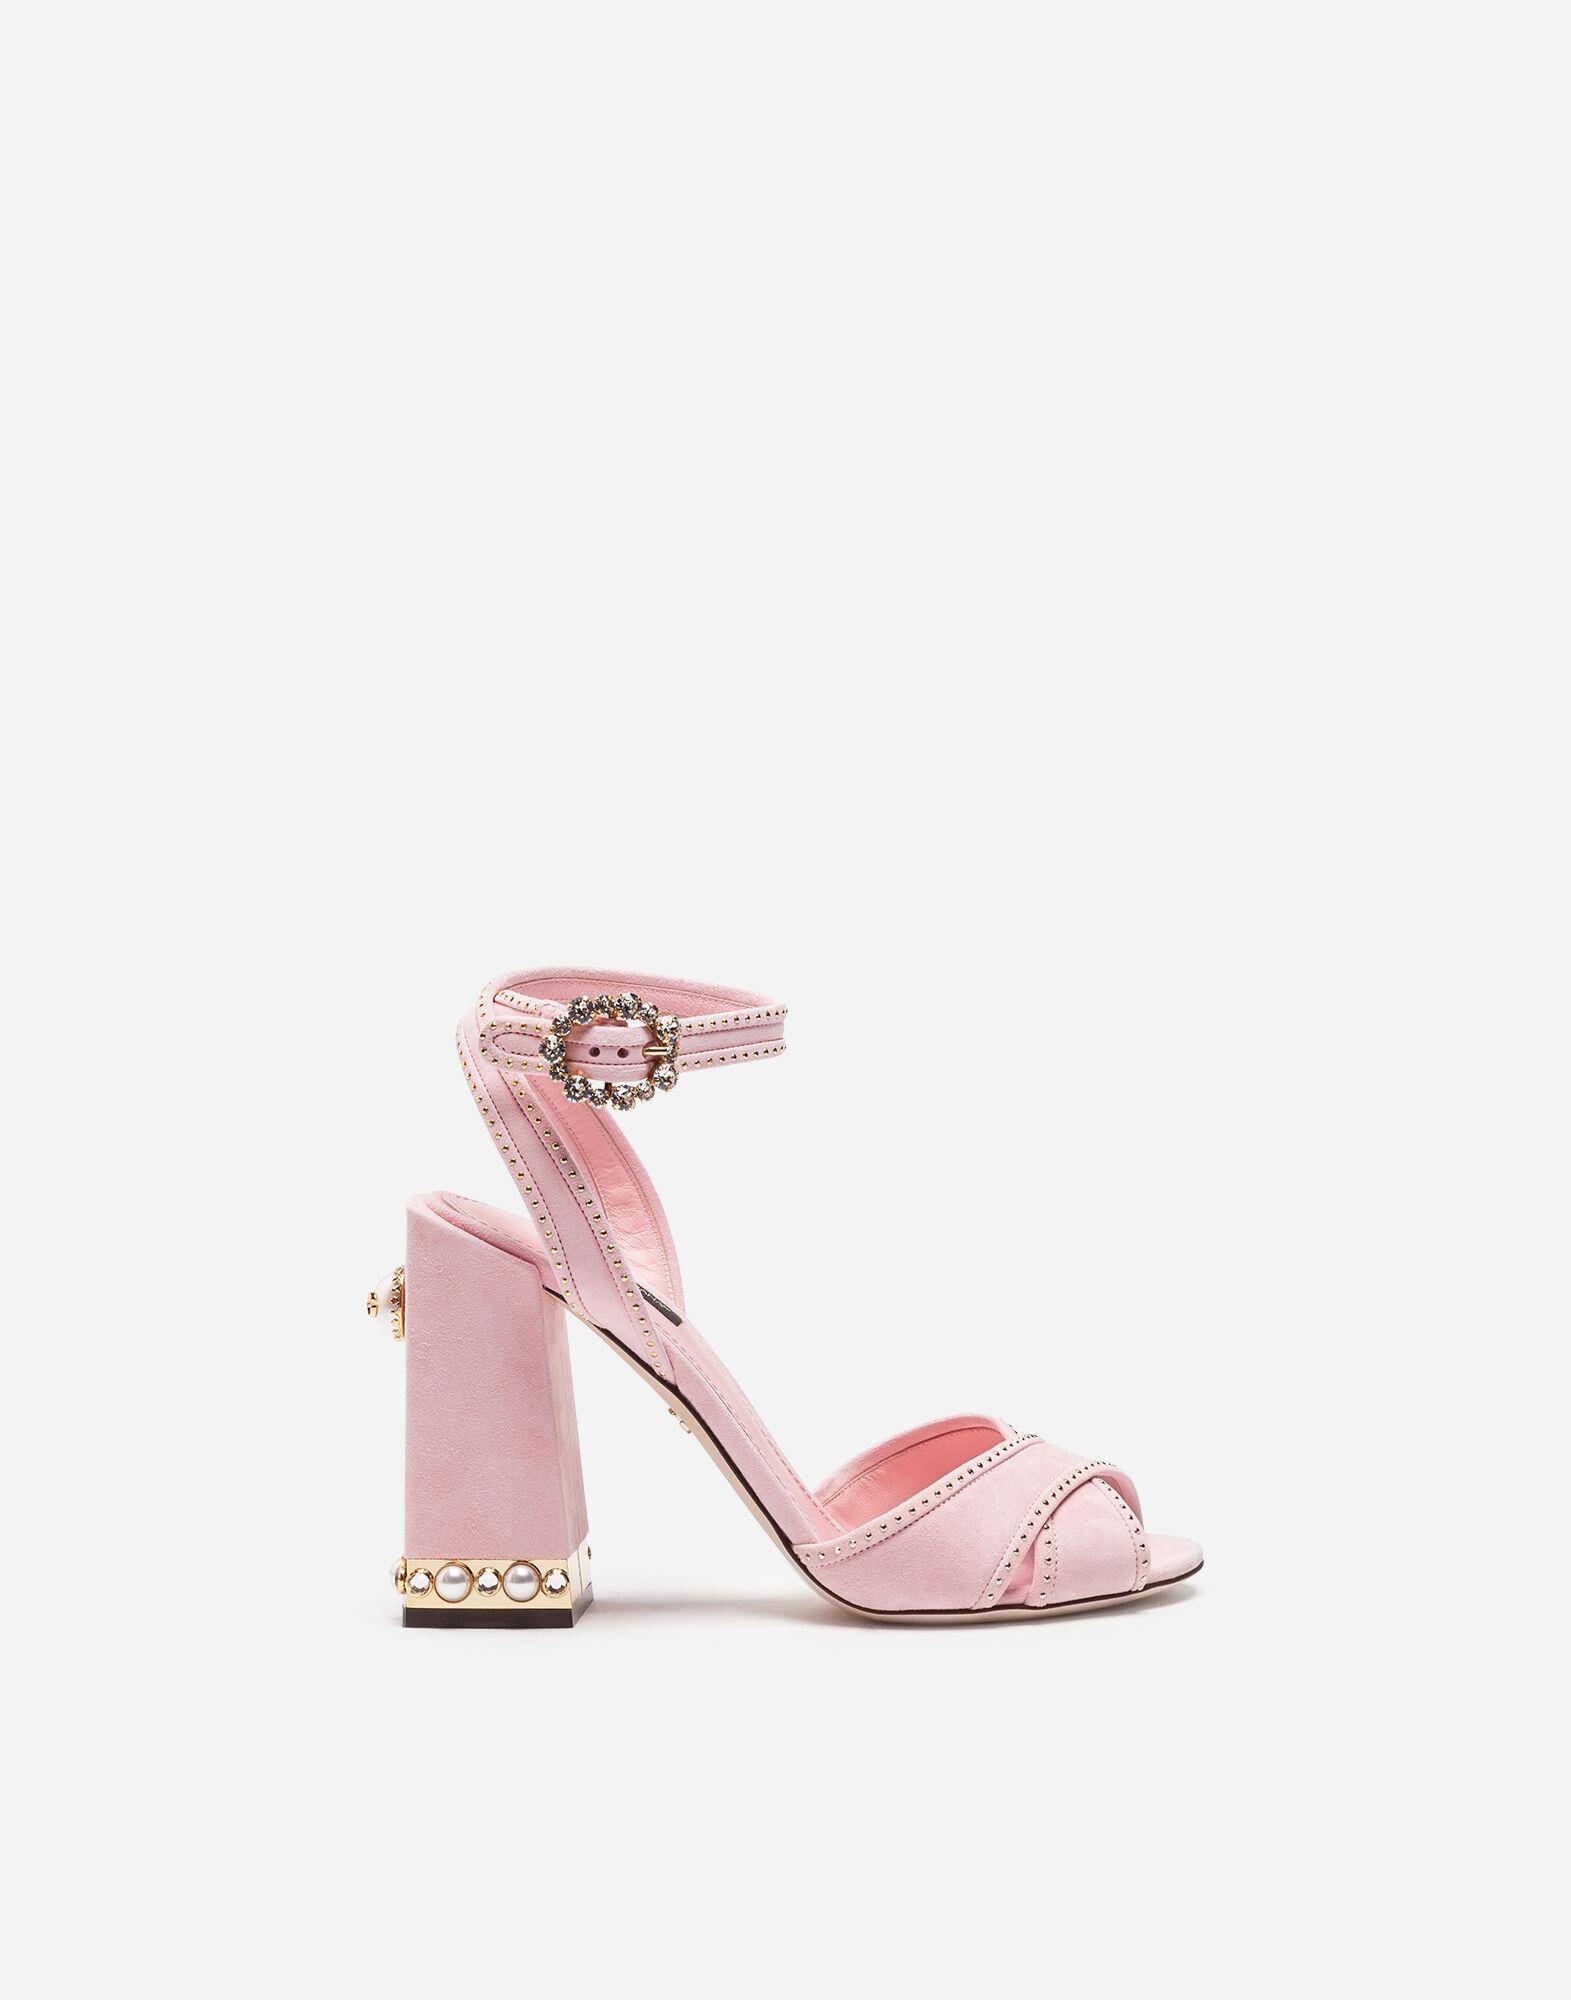 Dolce & Gabbana Woman Suede Sandals Bright Pink Size 35 Dolce & Gabbana 6FfhIF3